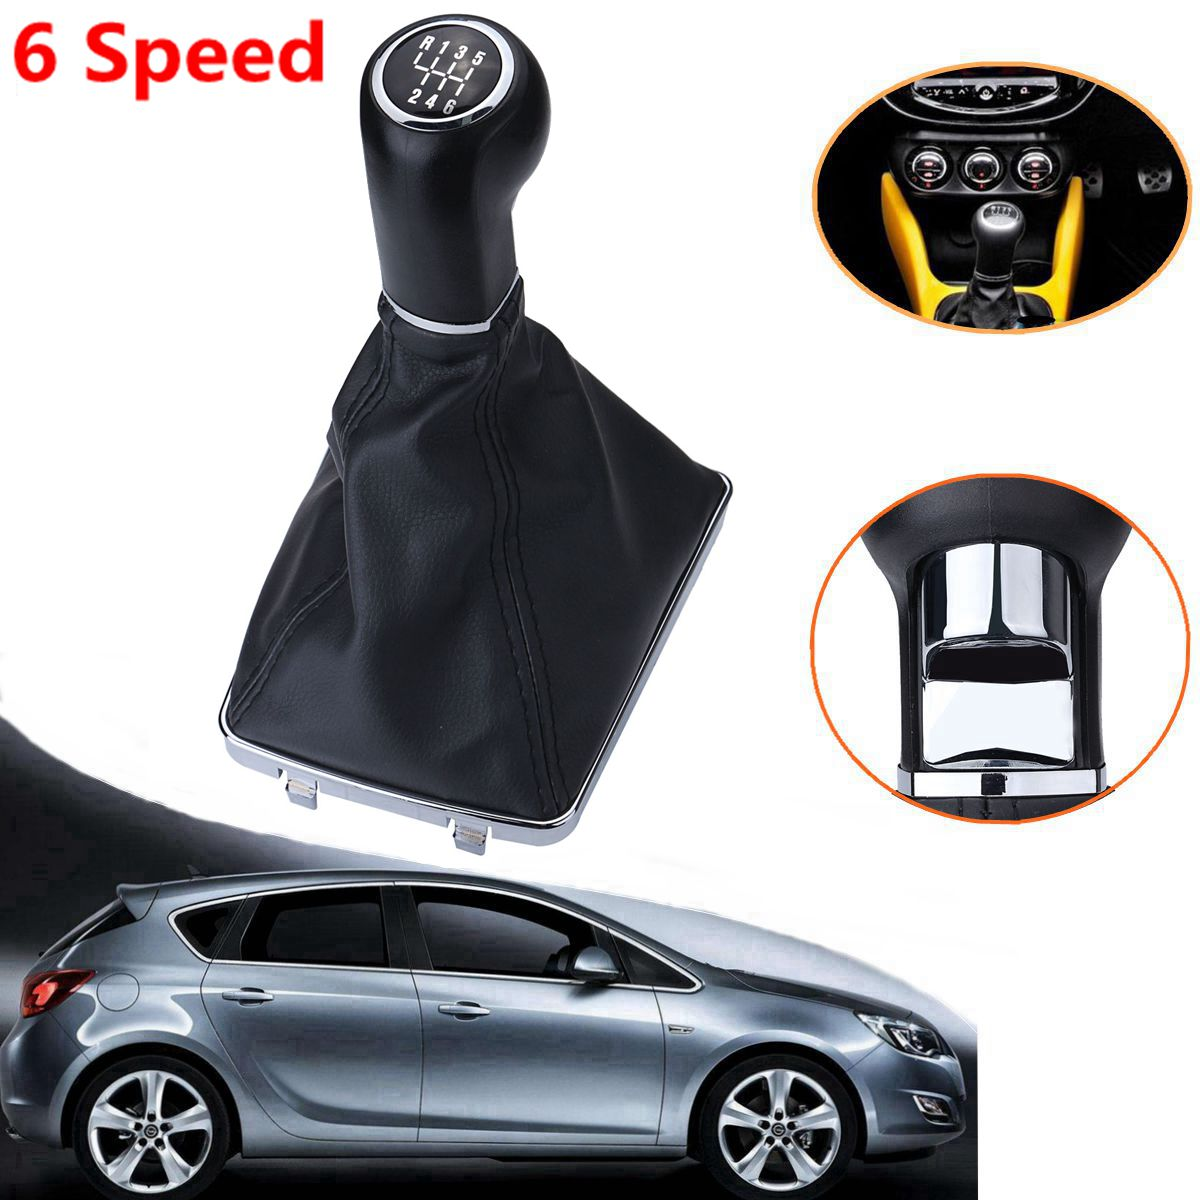 5/6 velocidades Car Gear Shift Knob palanca Gaiter Boot para Corsa Opel Astra GTC 2005 2006 2007 2008 2009 2010